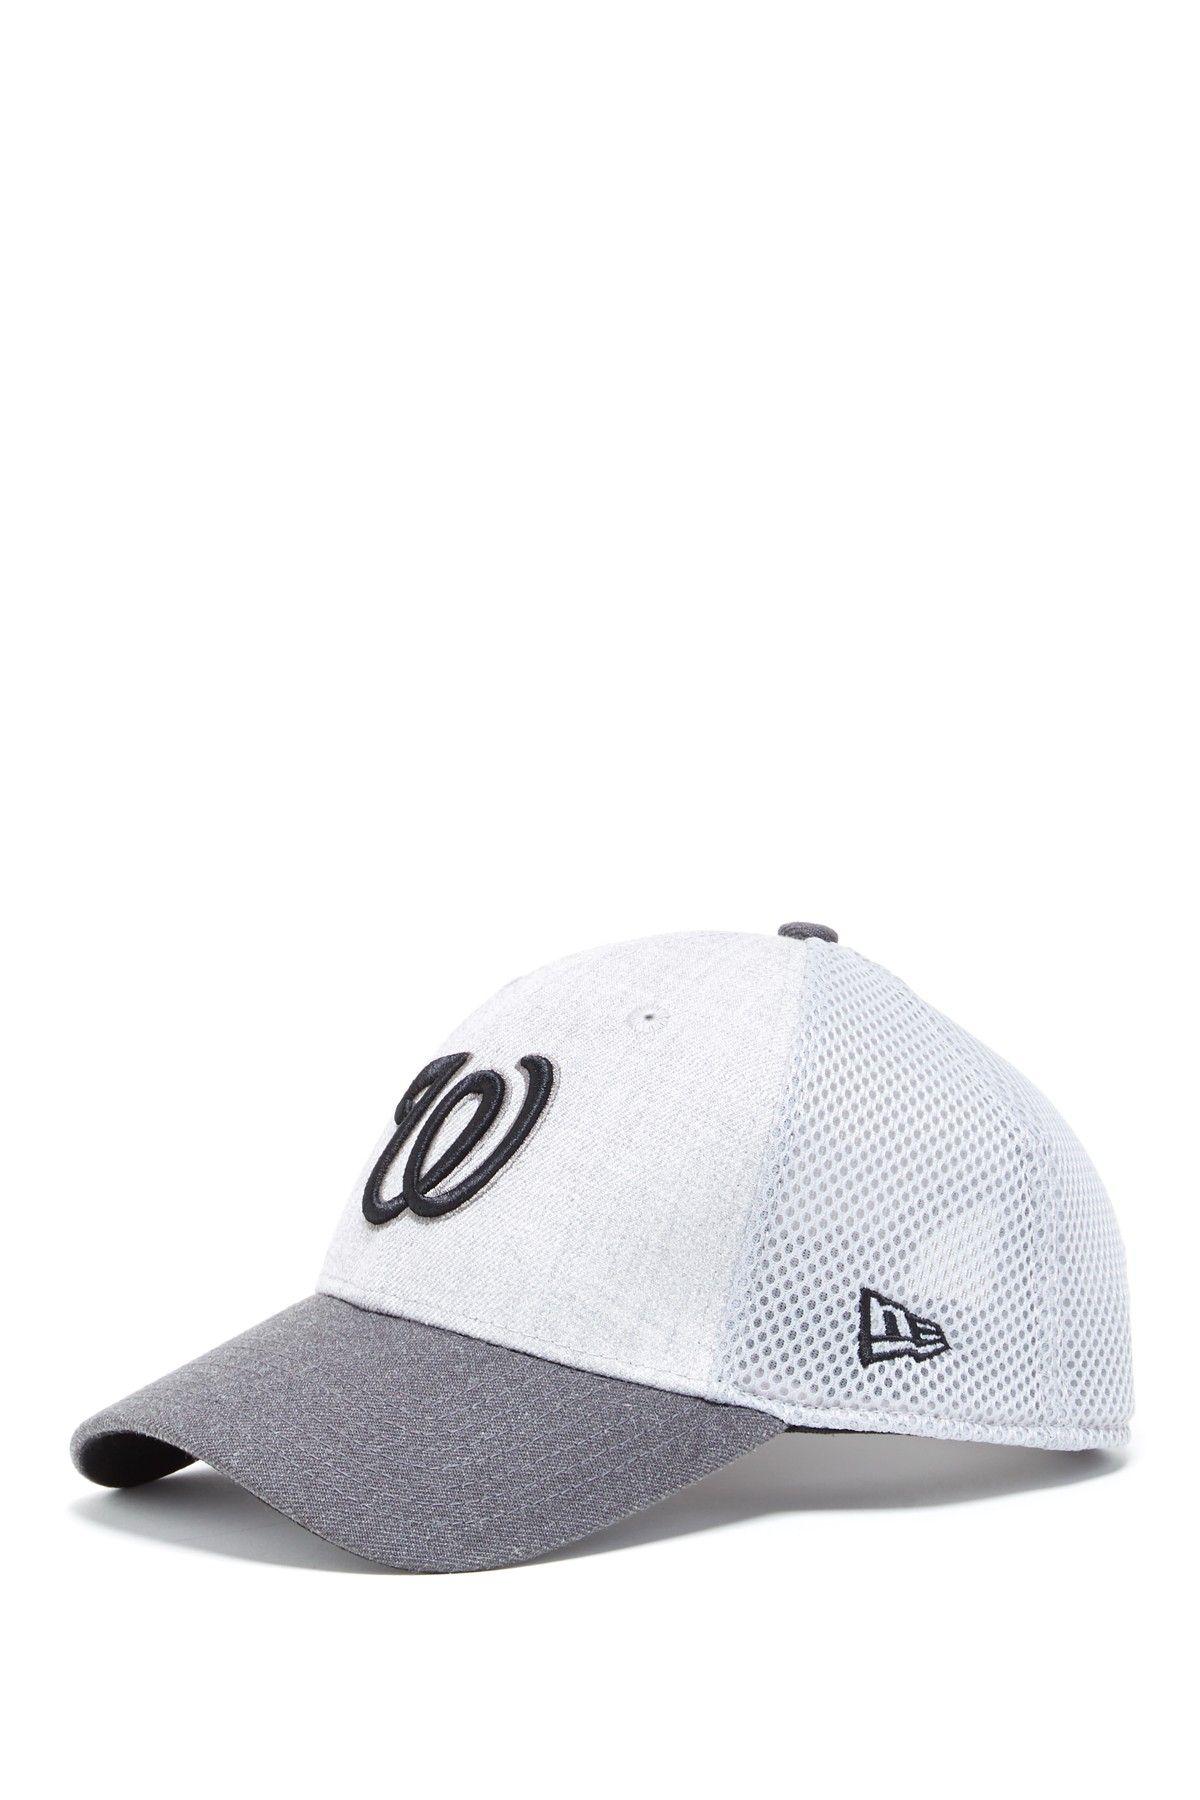 ... where can i buy mlb washington nationals team baseball cap gray 940 neo  8da08 e74f2 dc673966e499